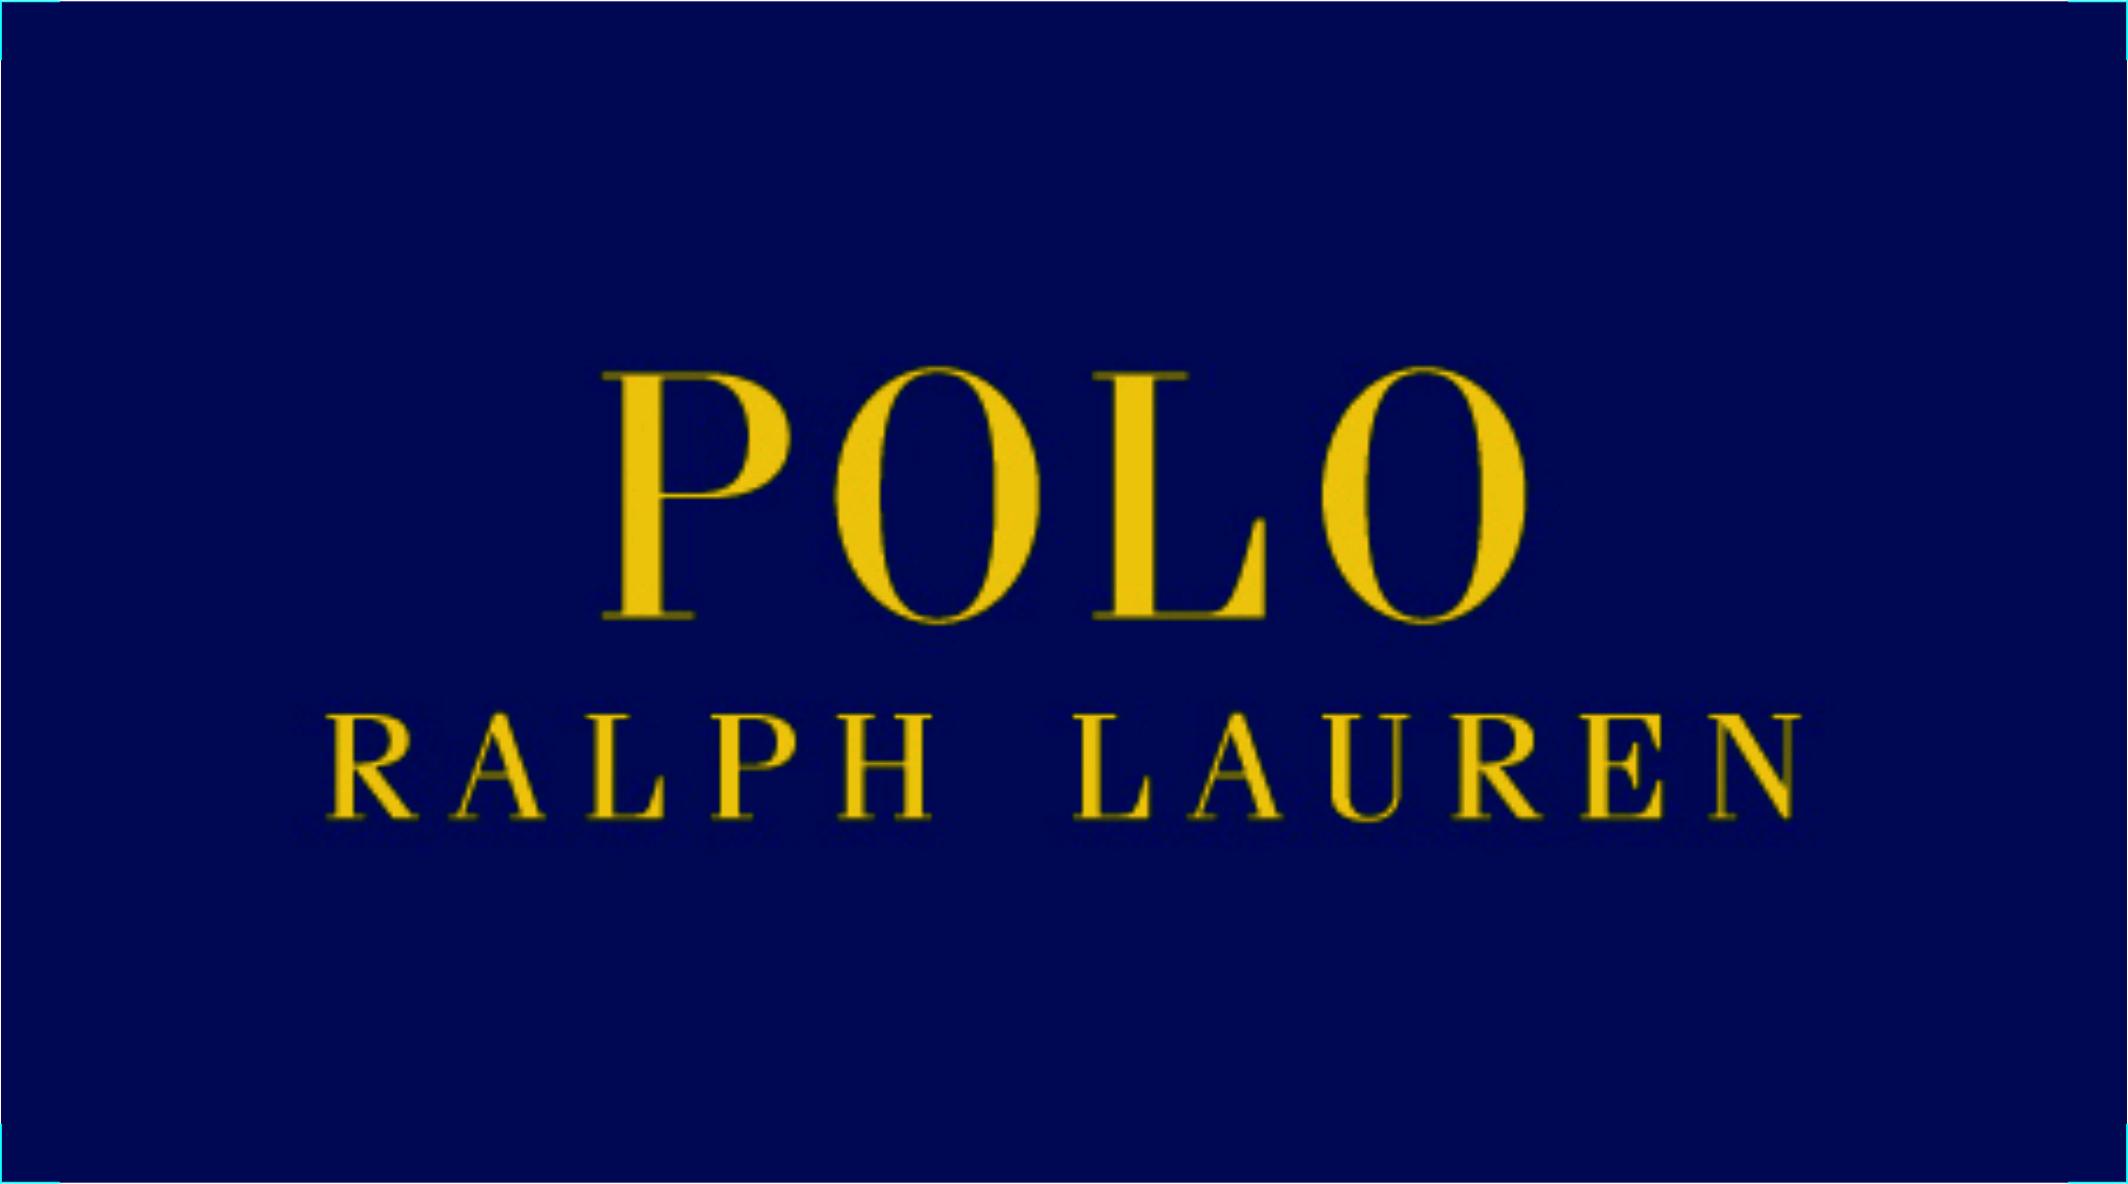 POLO - Ralph Lauren